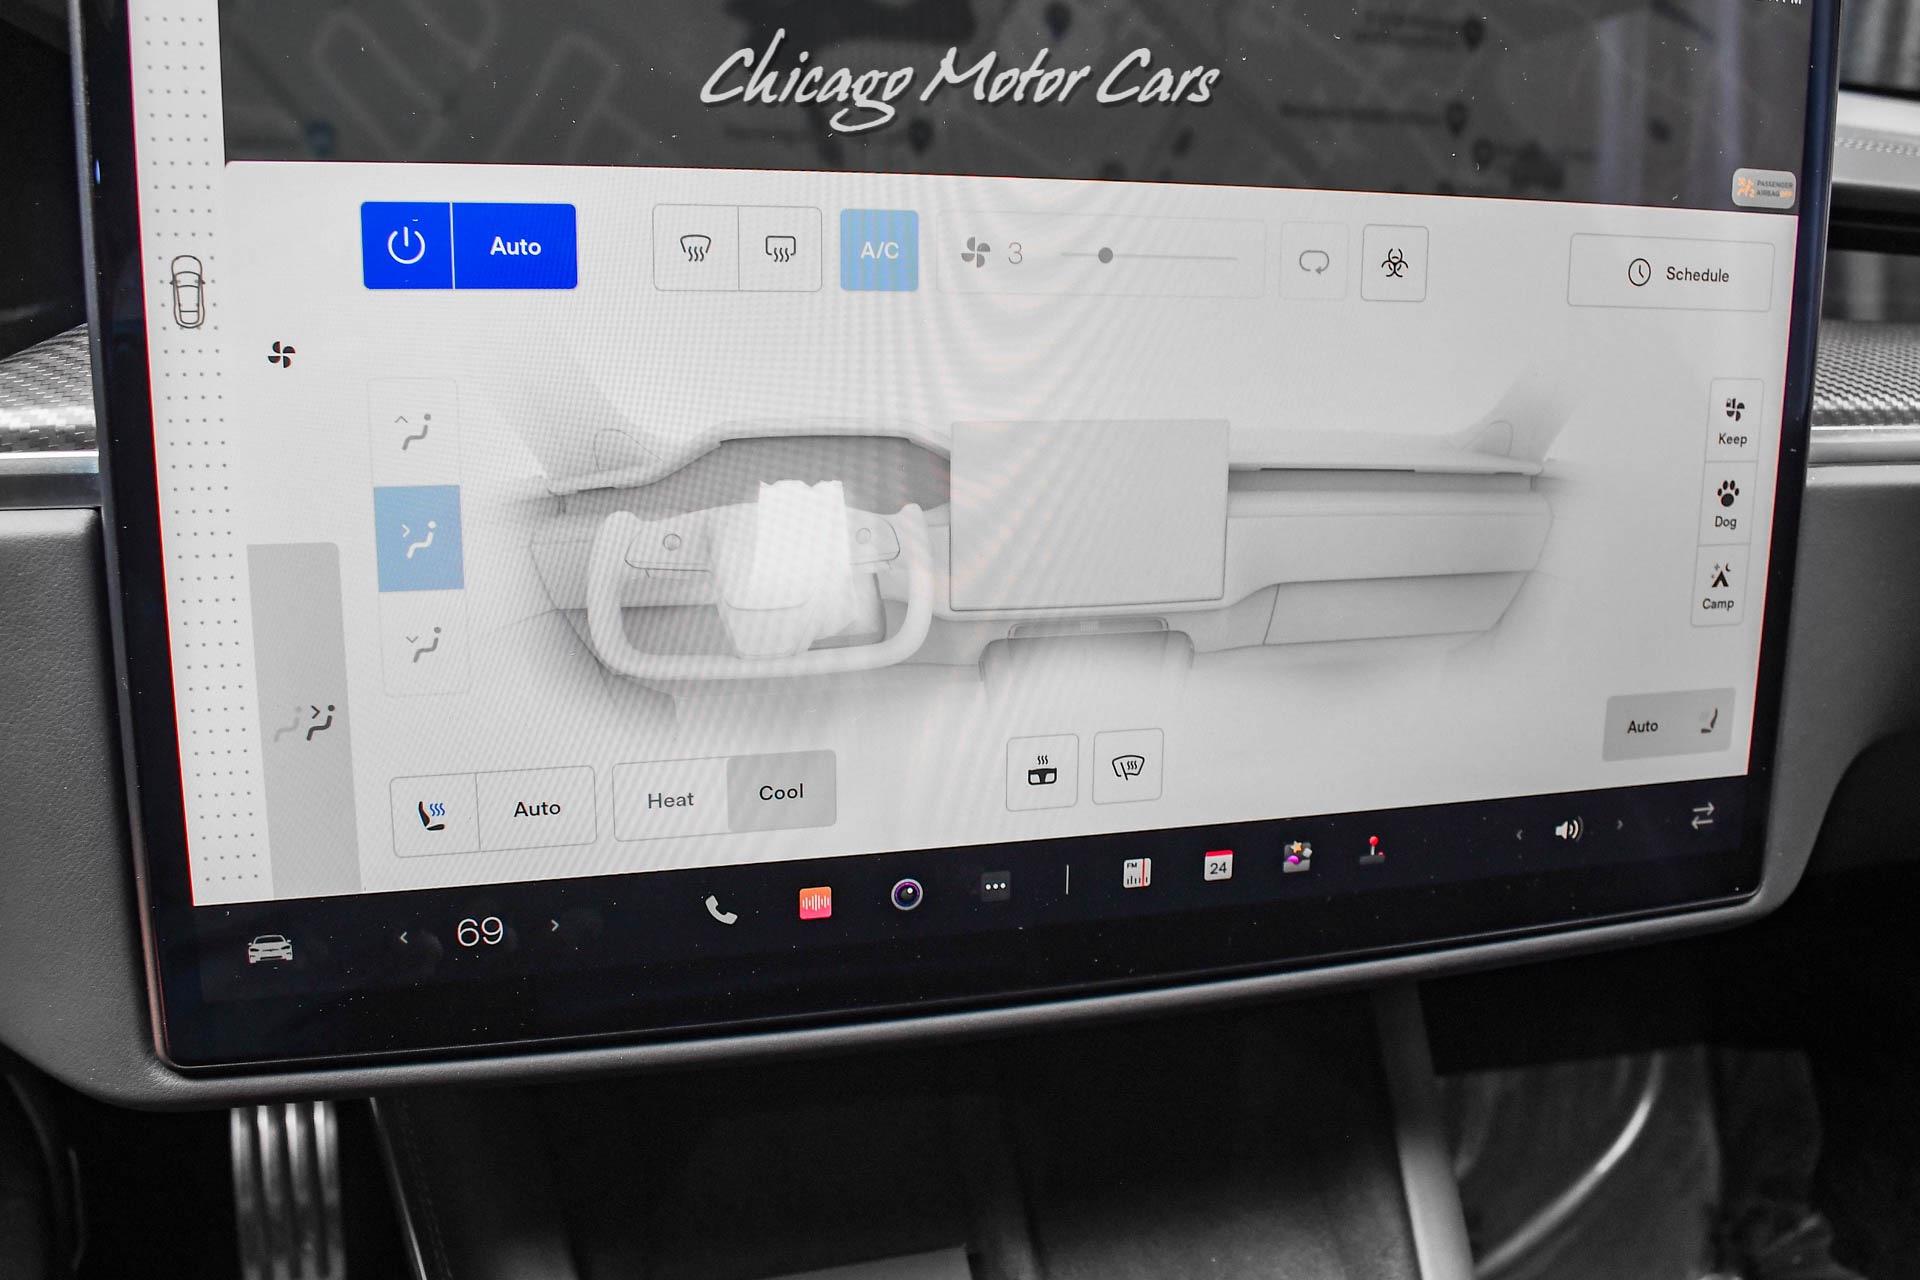 Used-2021-Tesla-Model-S-Plaid-Autopilot-21-Arachnid-Wheels-Delivery-Miles